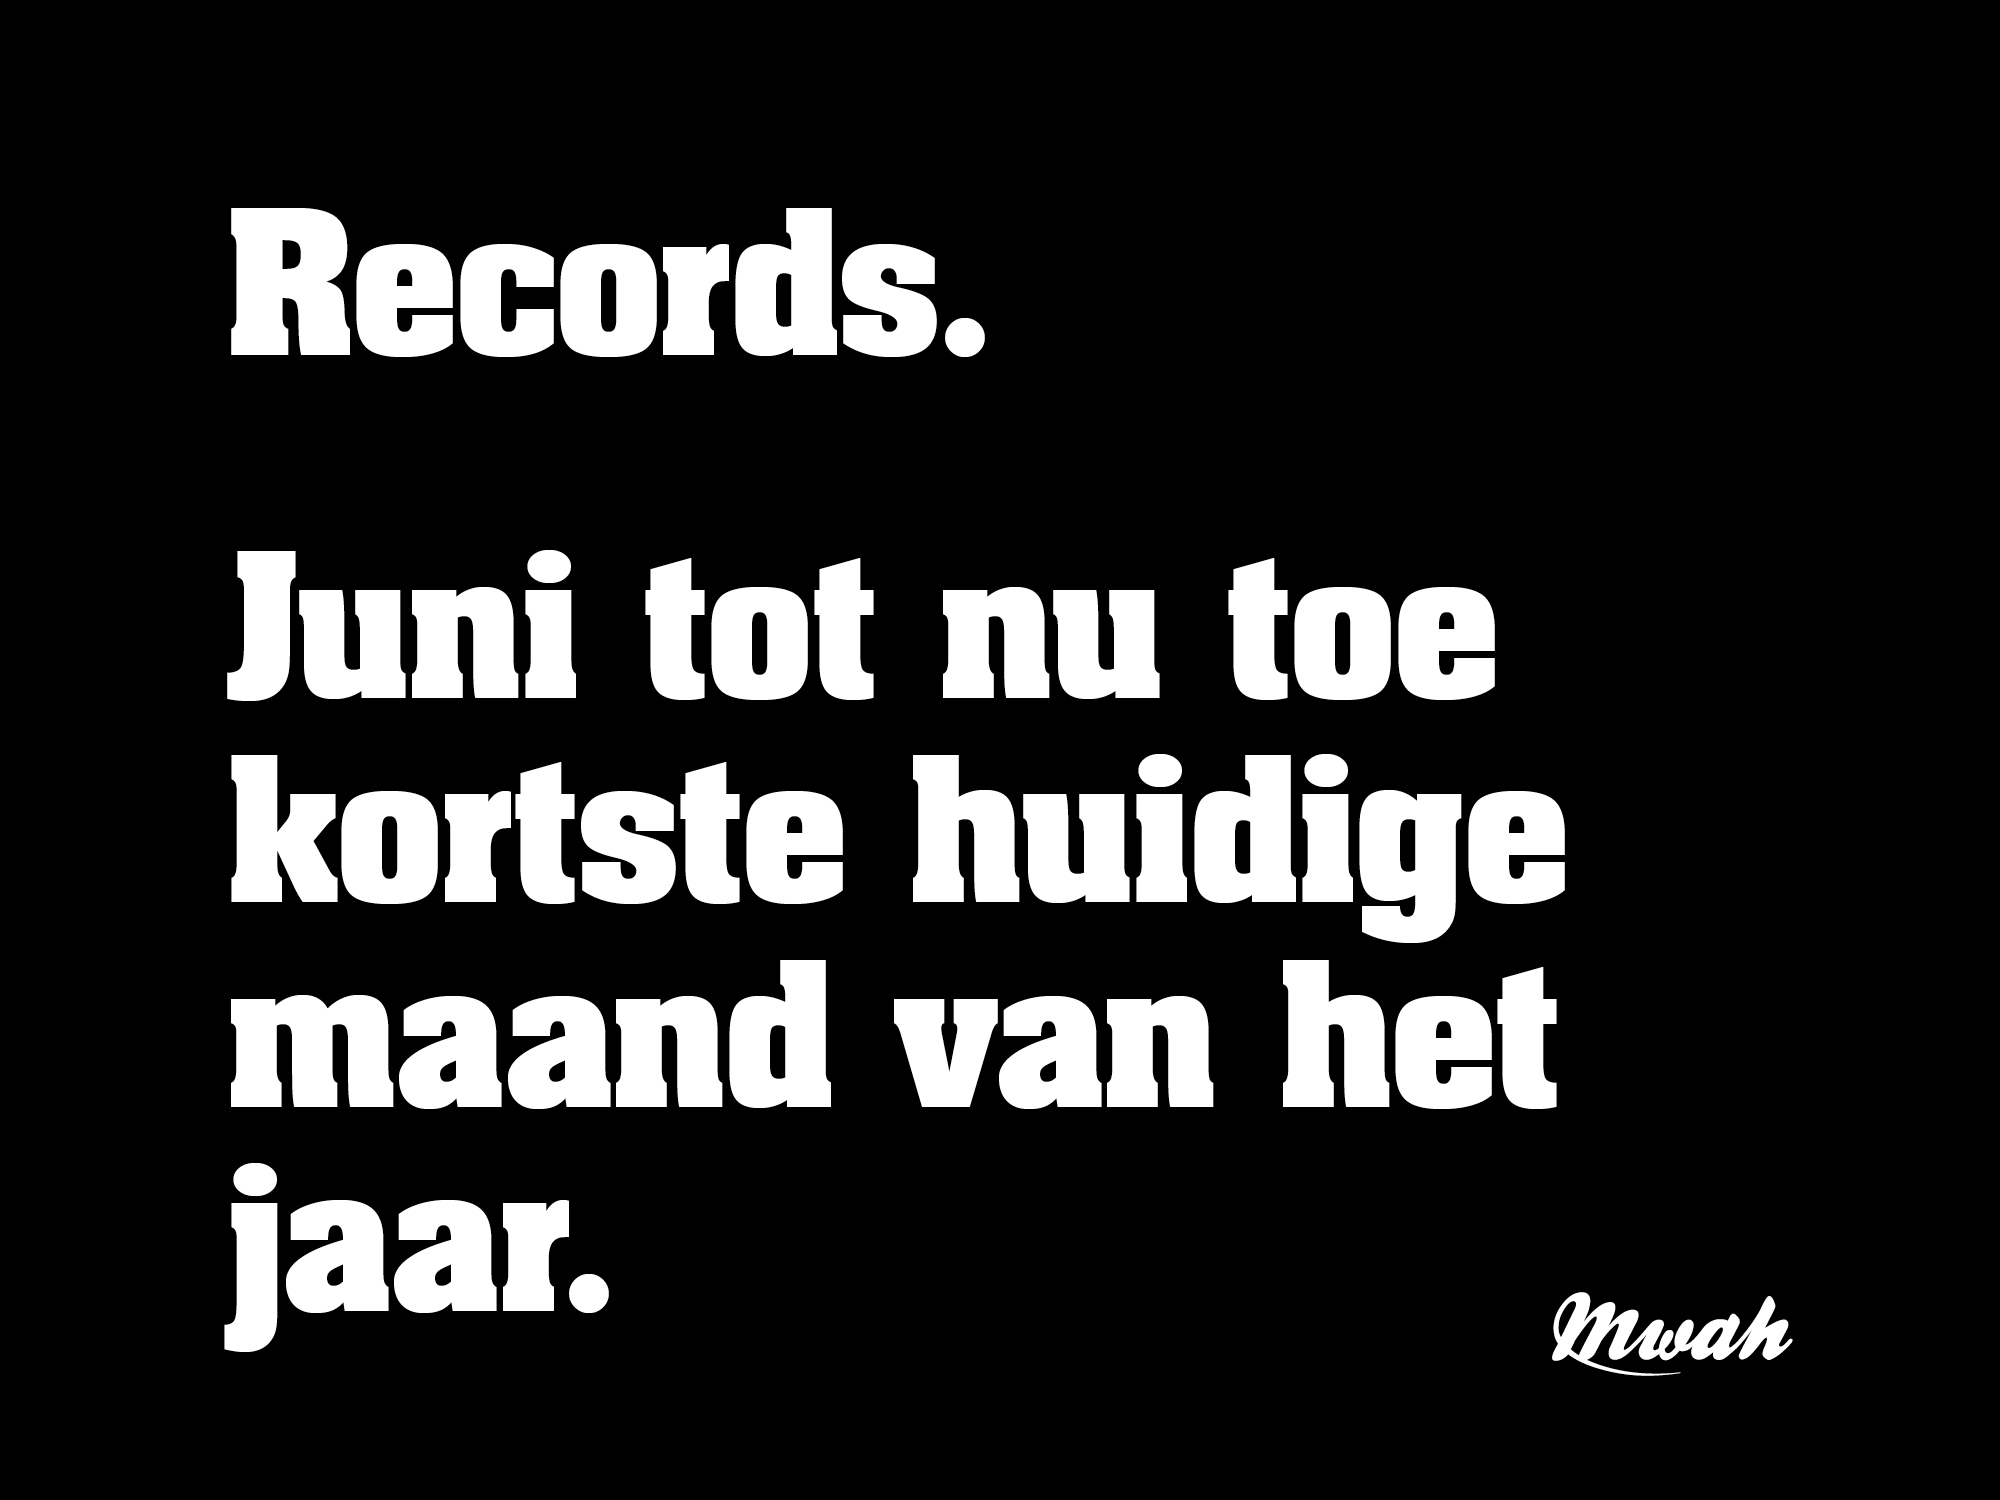 20180601_records